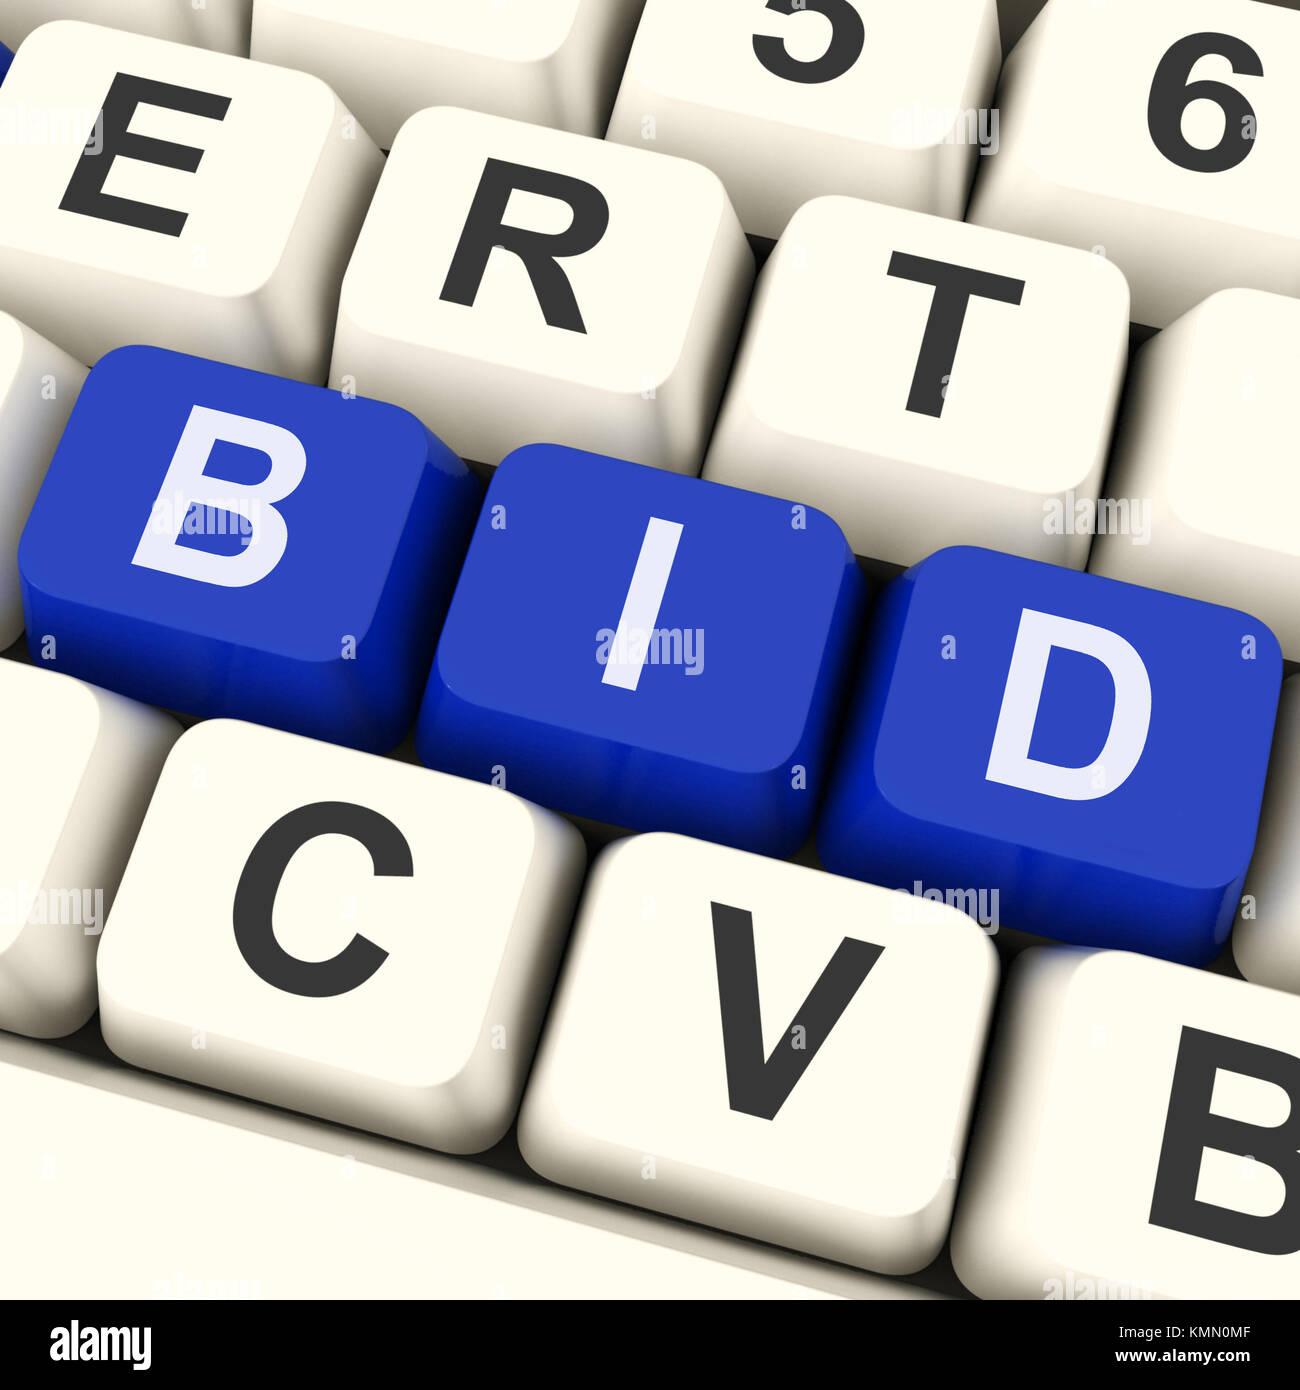 Bid Keys Showing Online Bidding Or Auction - Stock Image